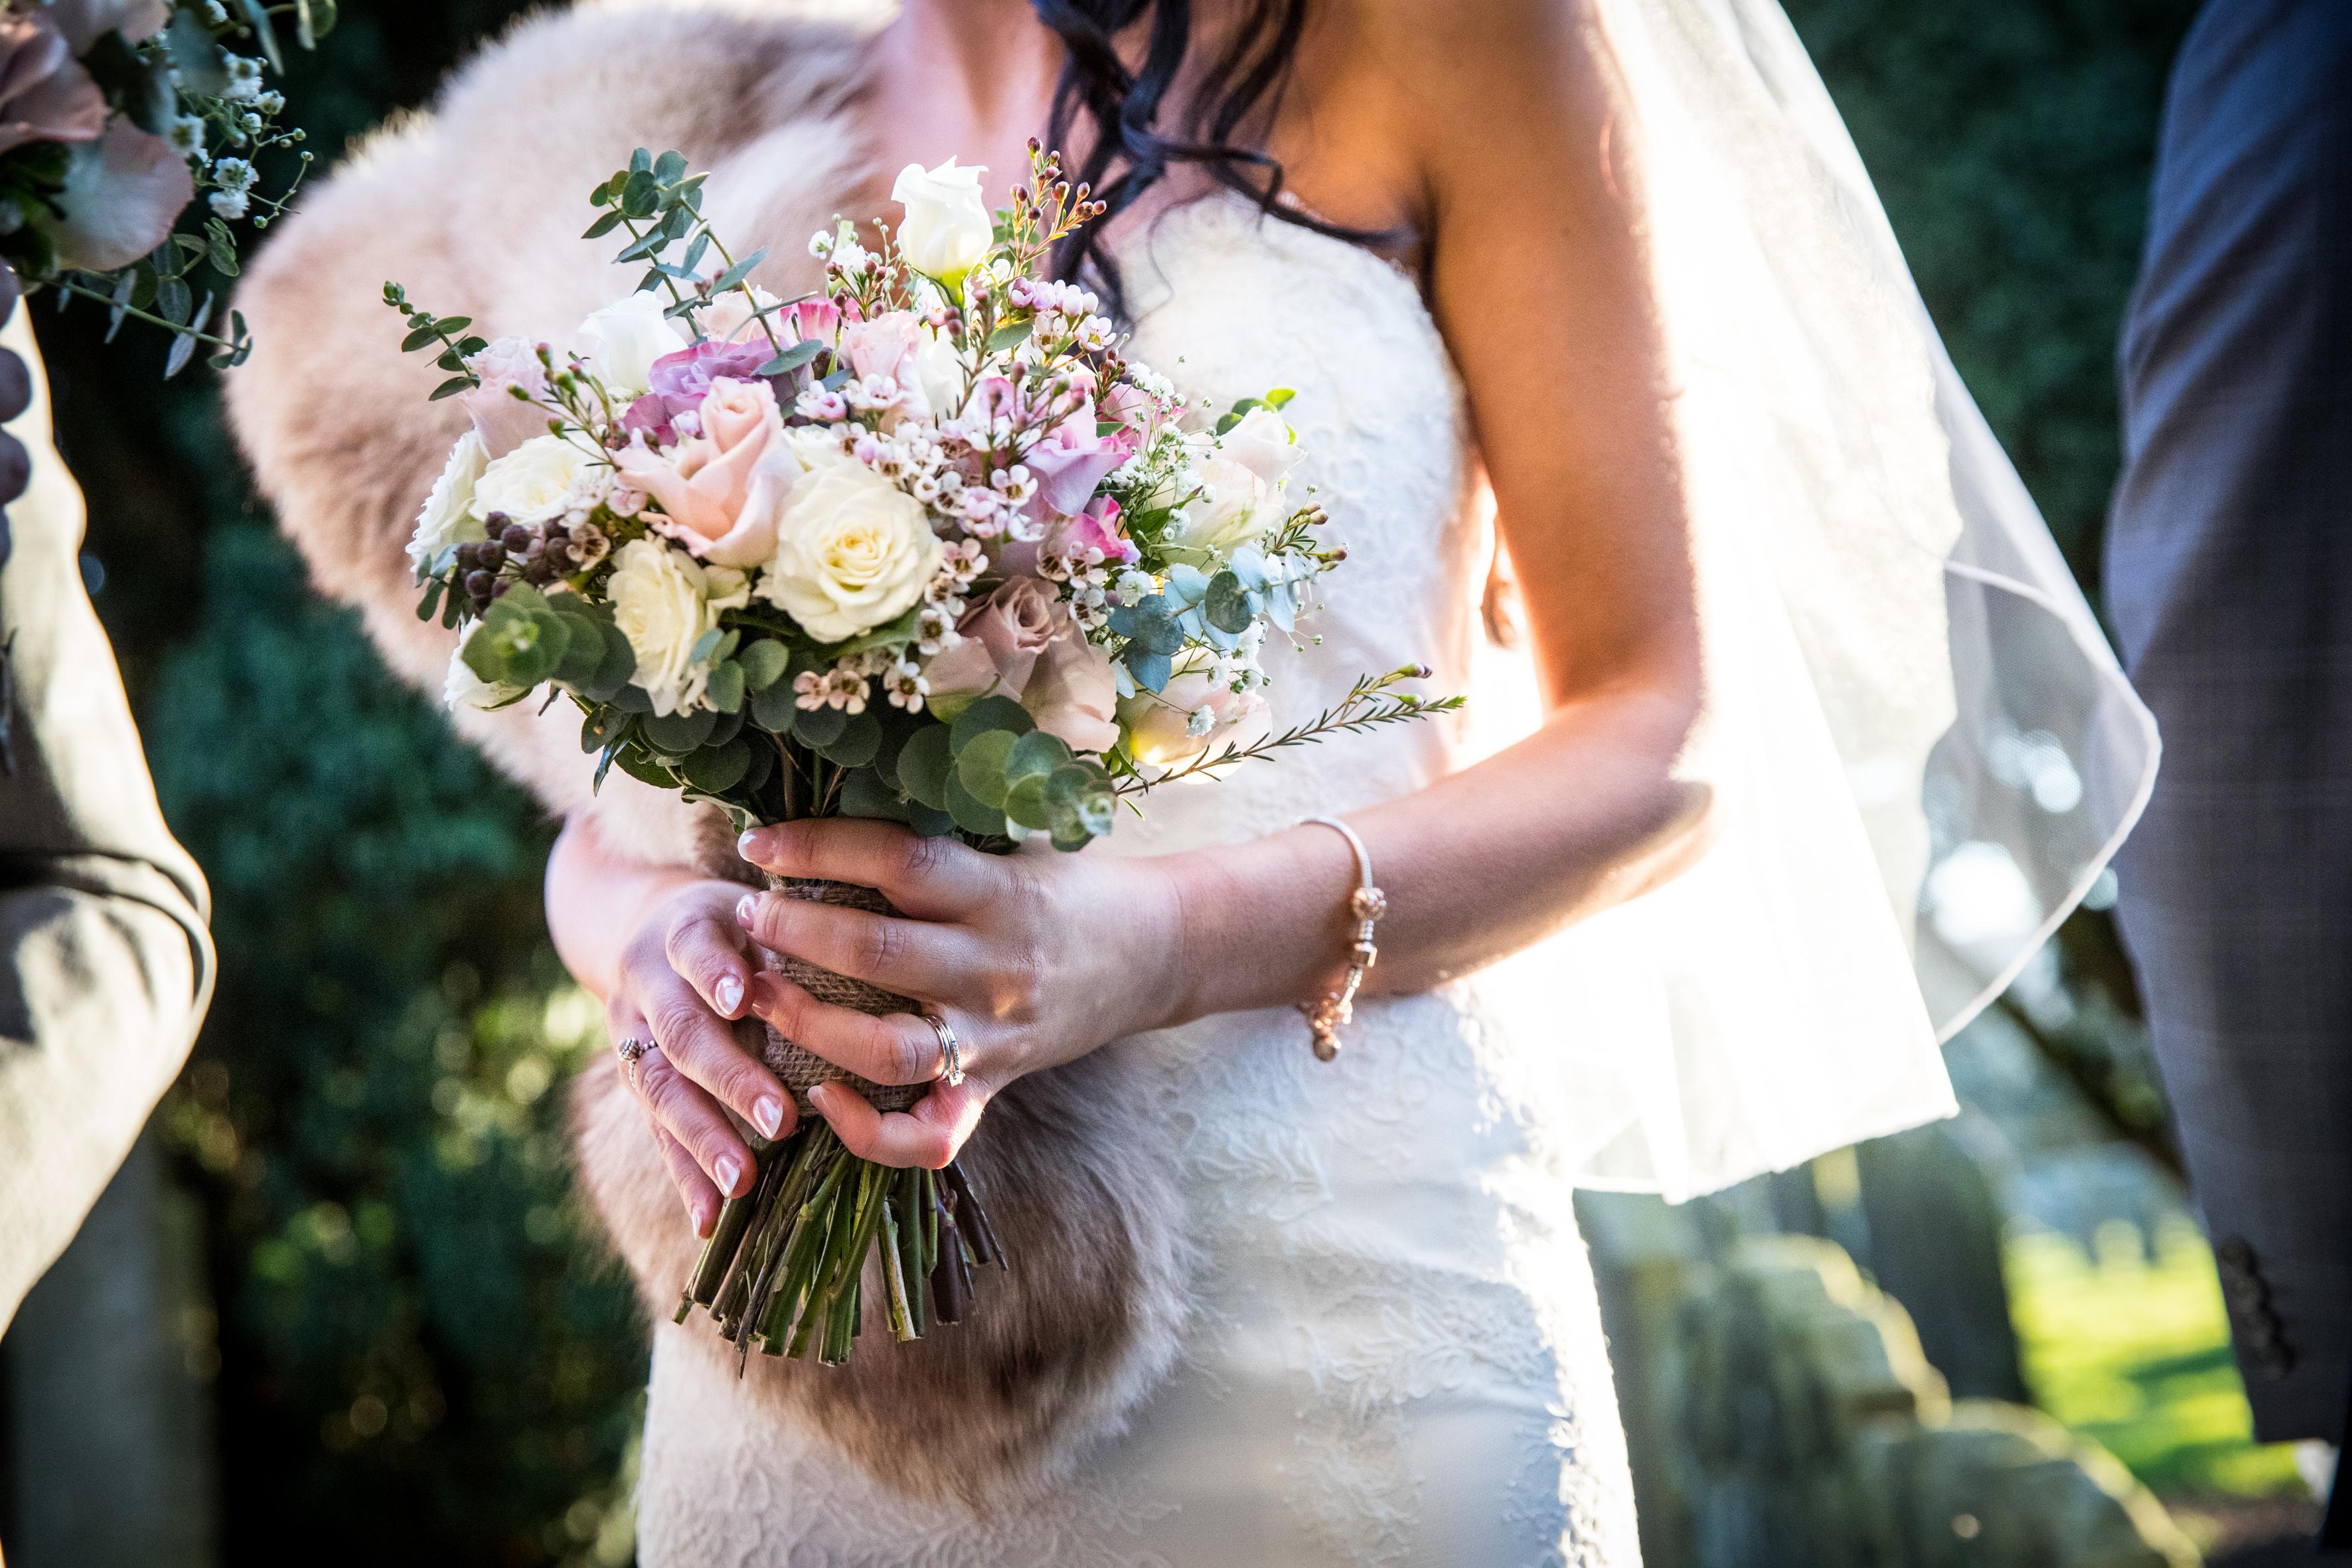 Wearmouth-wedding-7173-2